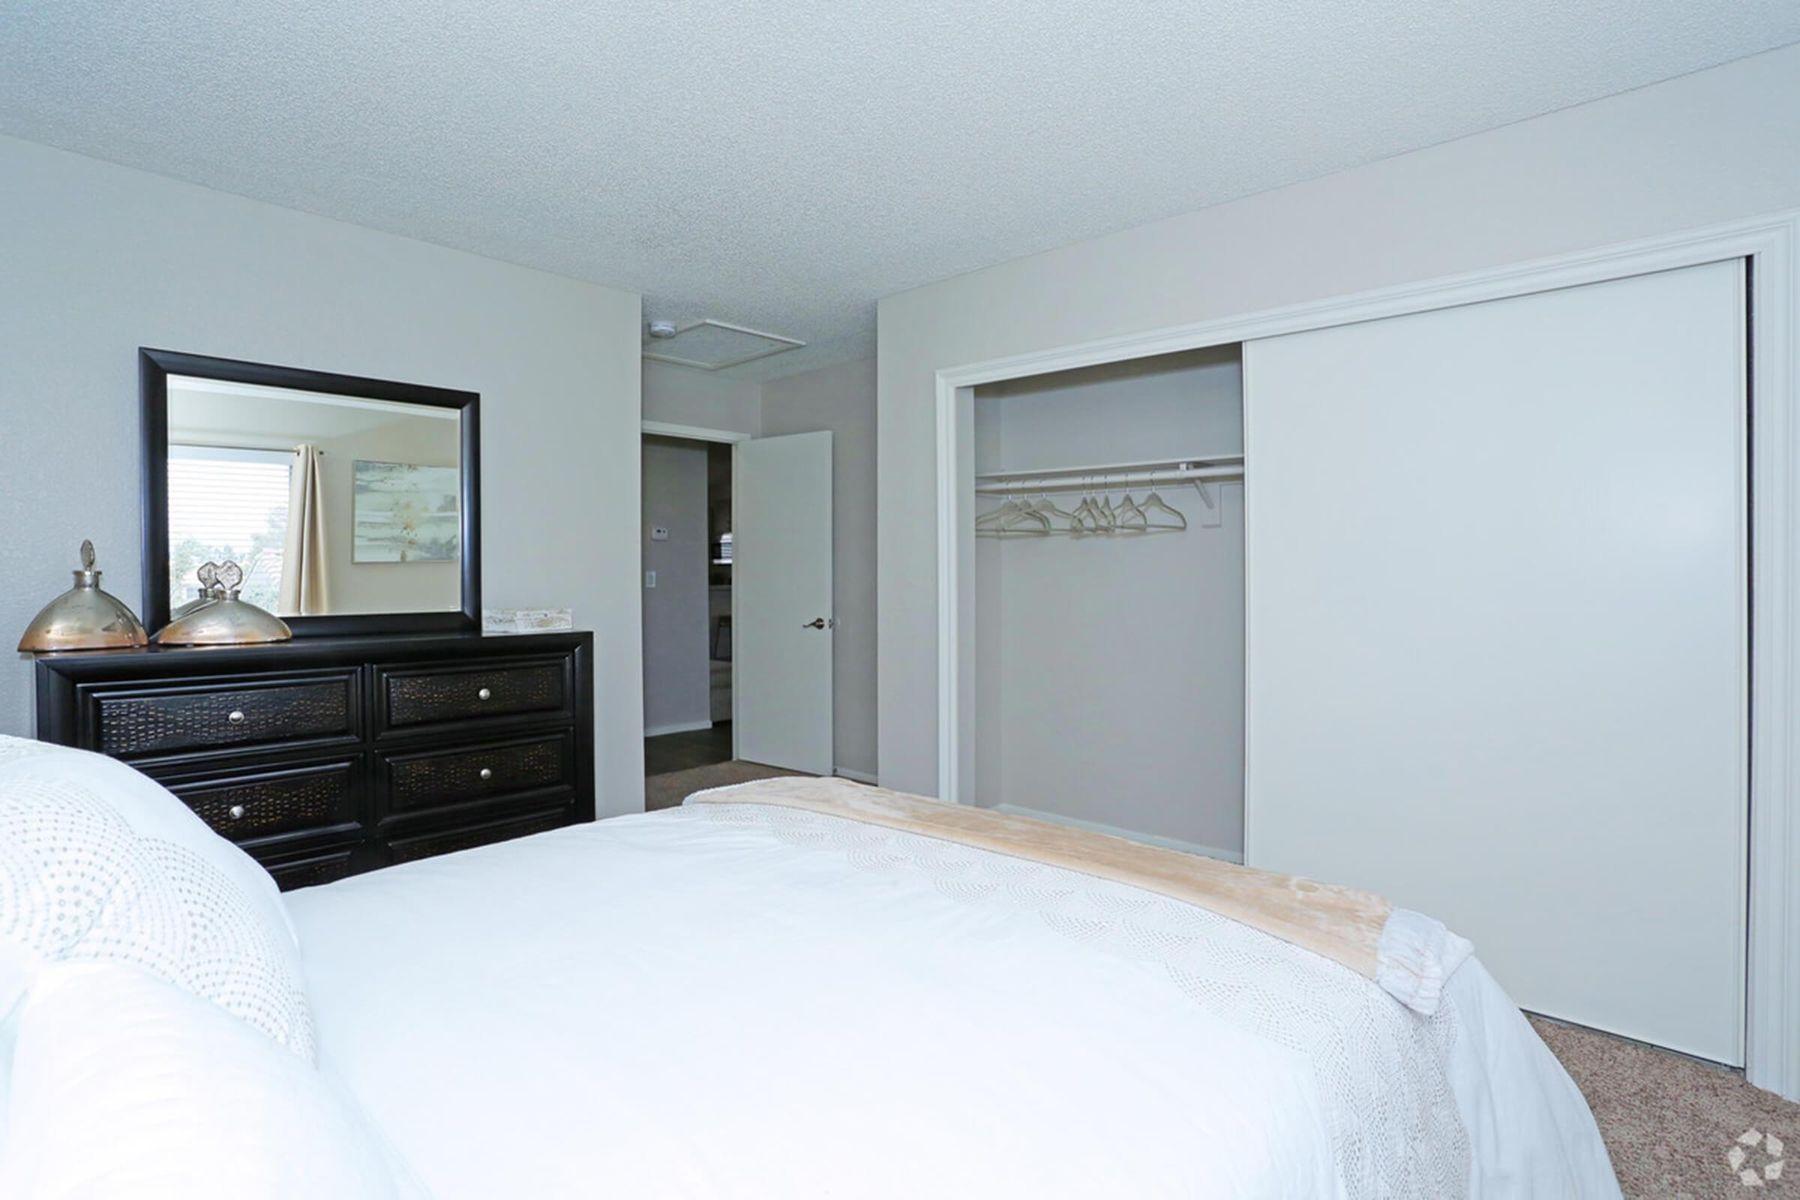 sunset-hills-apartments-henderson-nv-2br-2ba---960-sf-master-bedroom (2).jpg